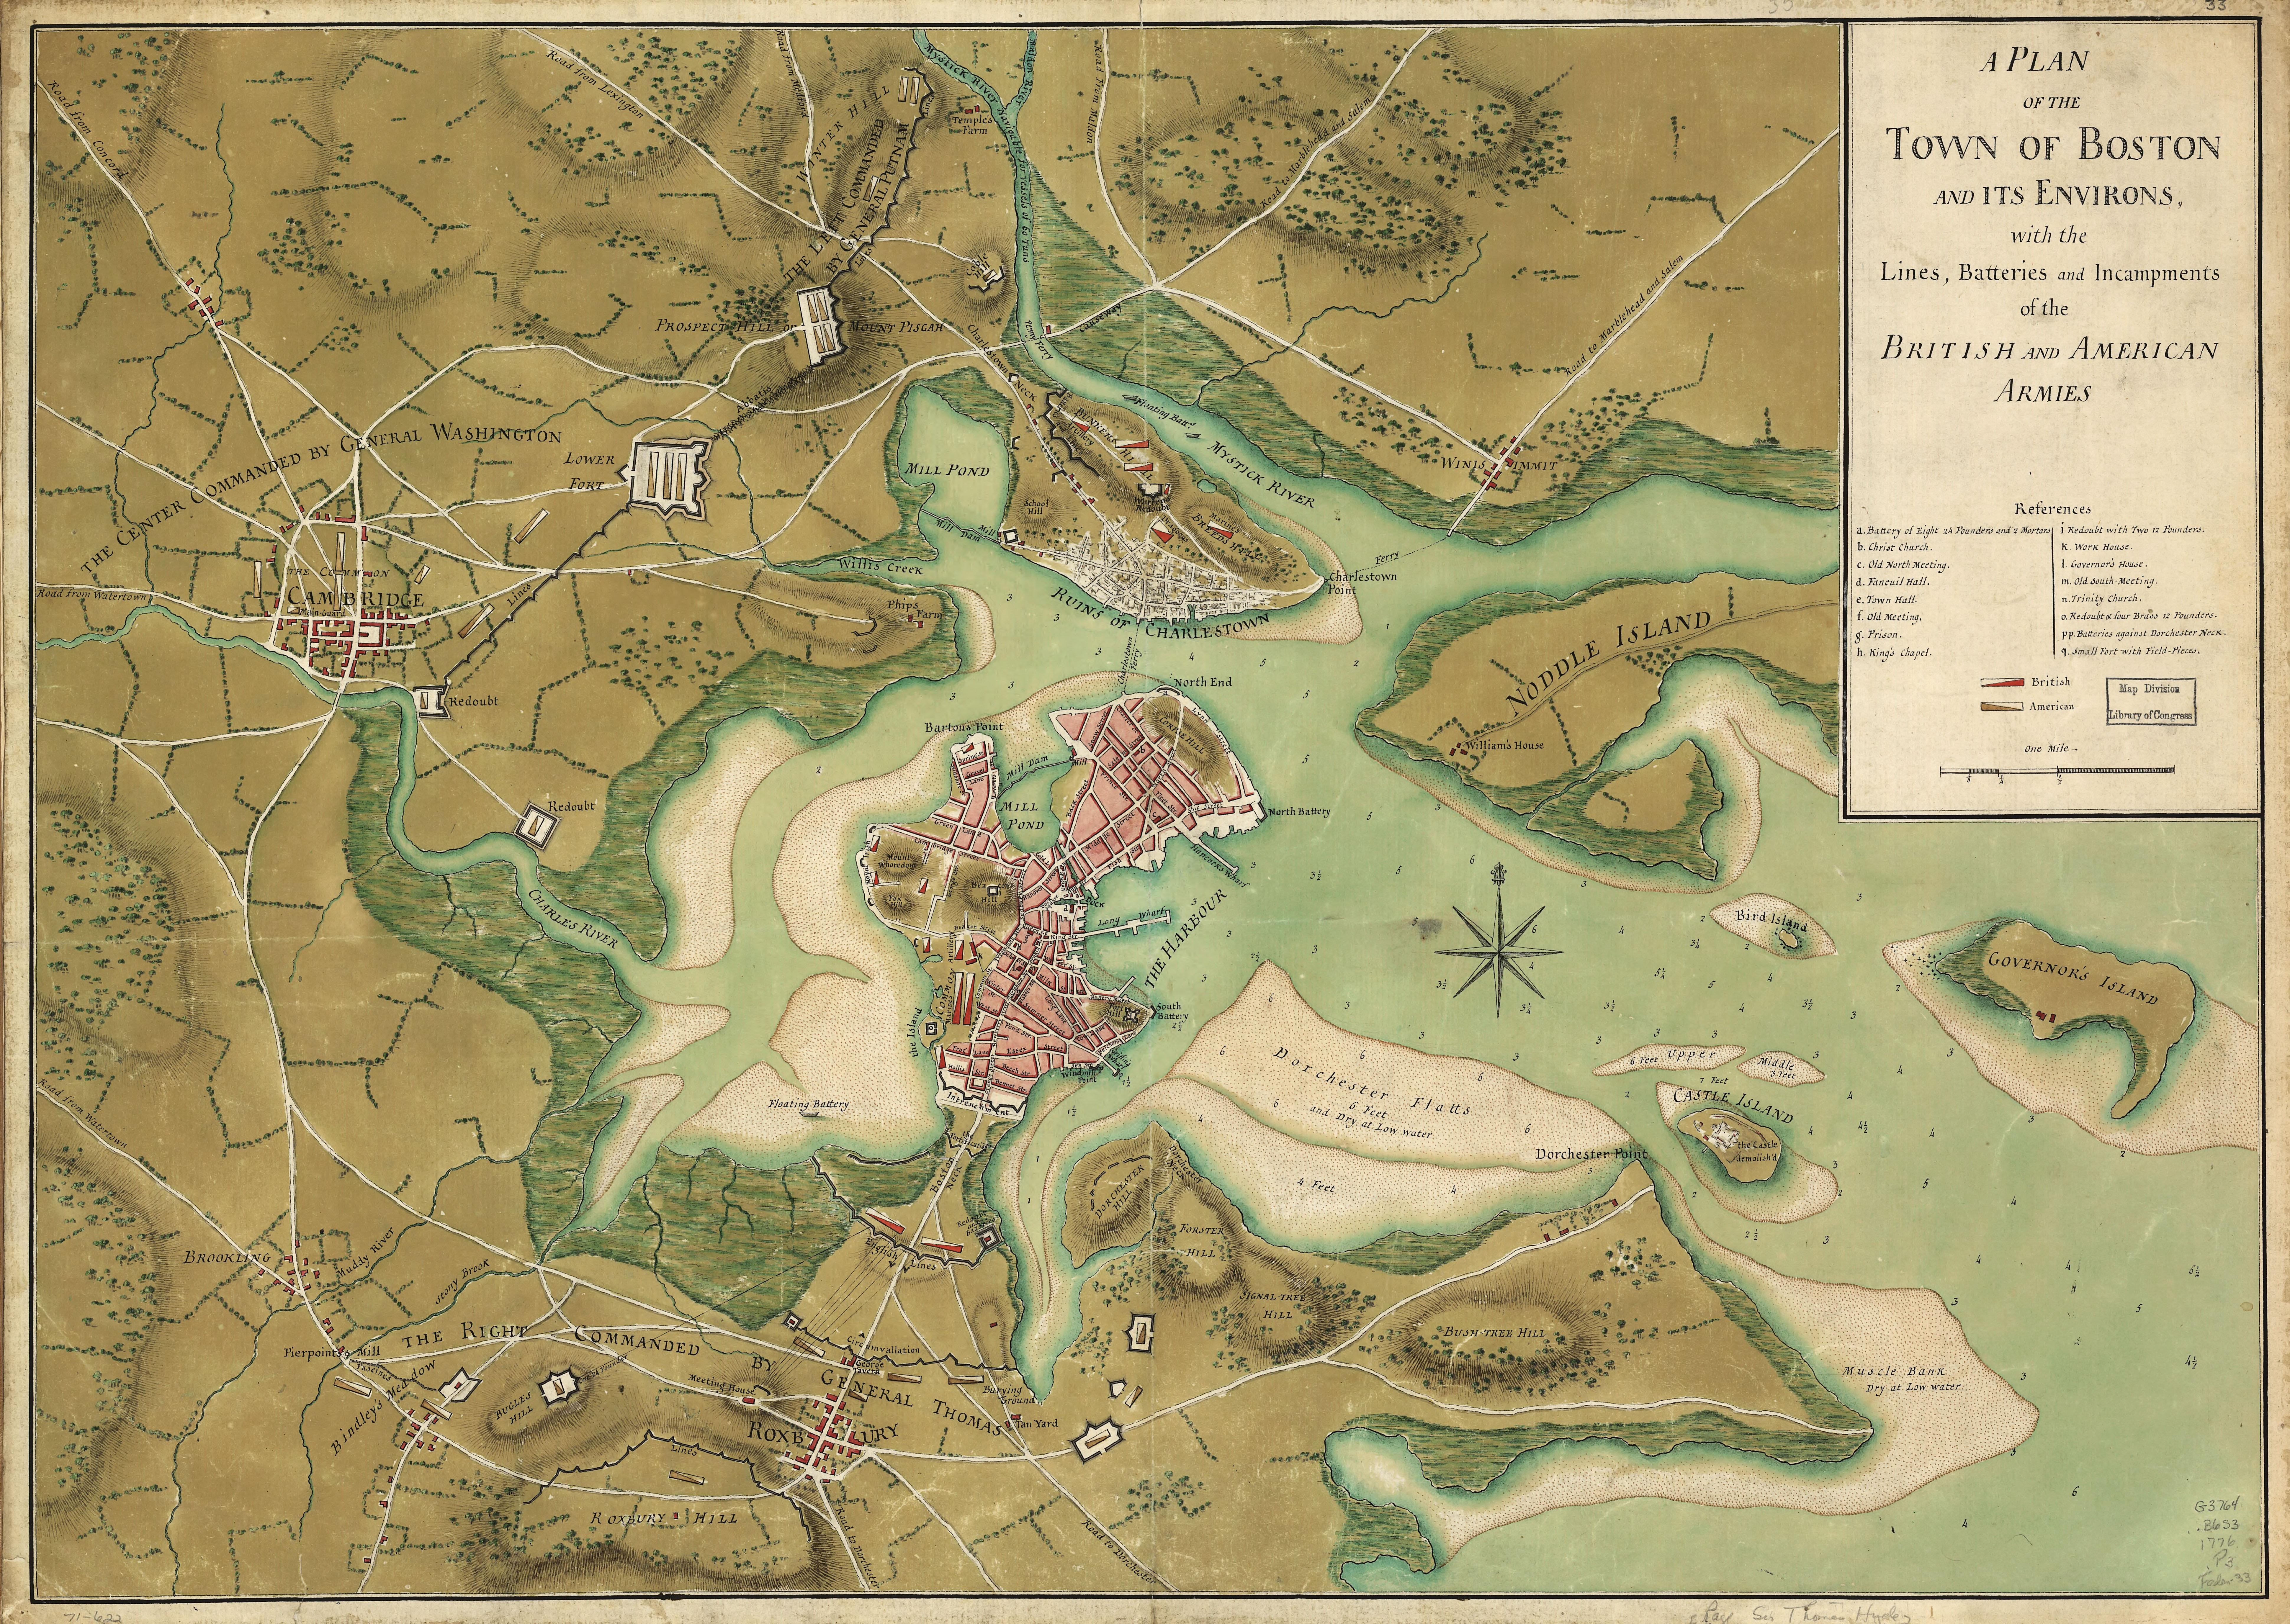 Two Revolutionary War Maps of Boston Harbor (1776)